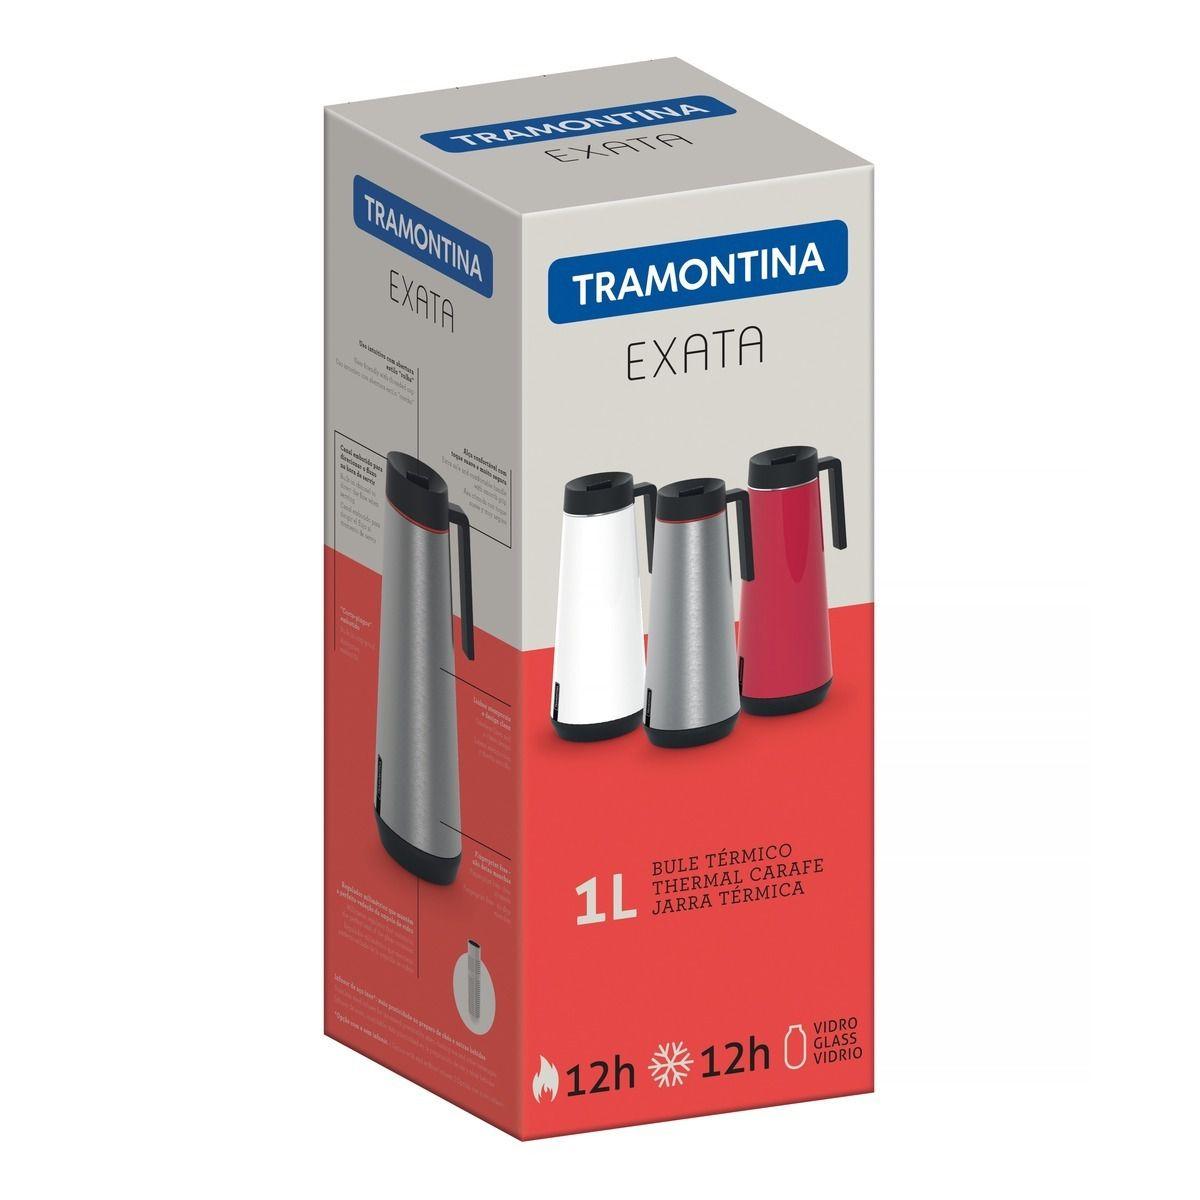 GARRAFA BULE TÉRMICO INOX 1L EXATA - TRAMONTINA 61645/100